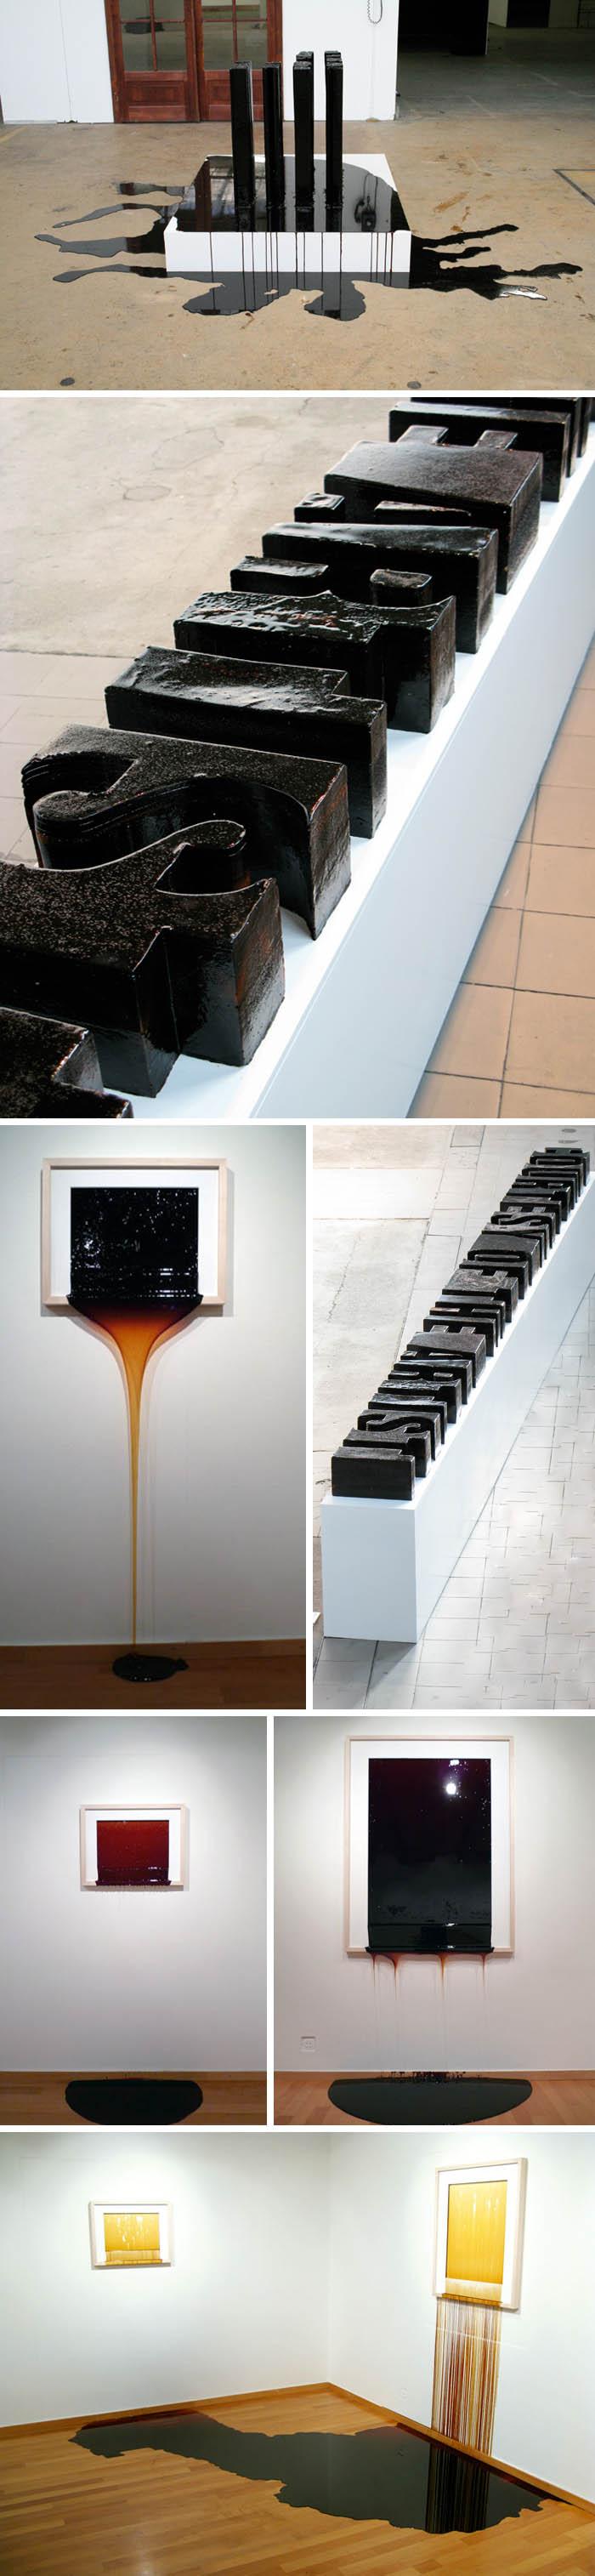 Typography, cool sculptures and artwork made of burnt sugar that melt, Jonas Etter, contemporary Swiss art